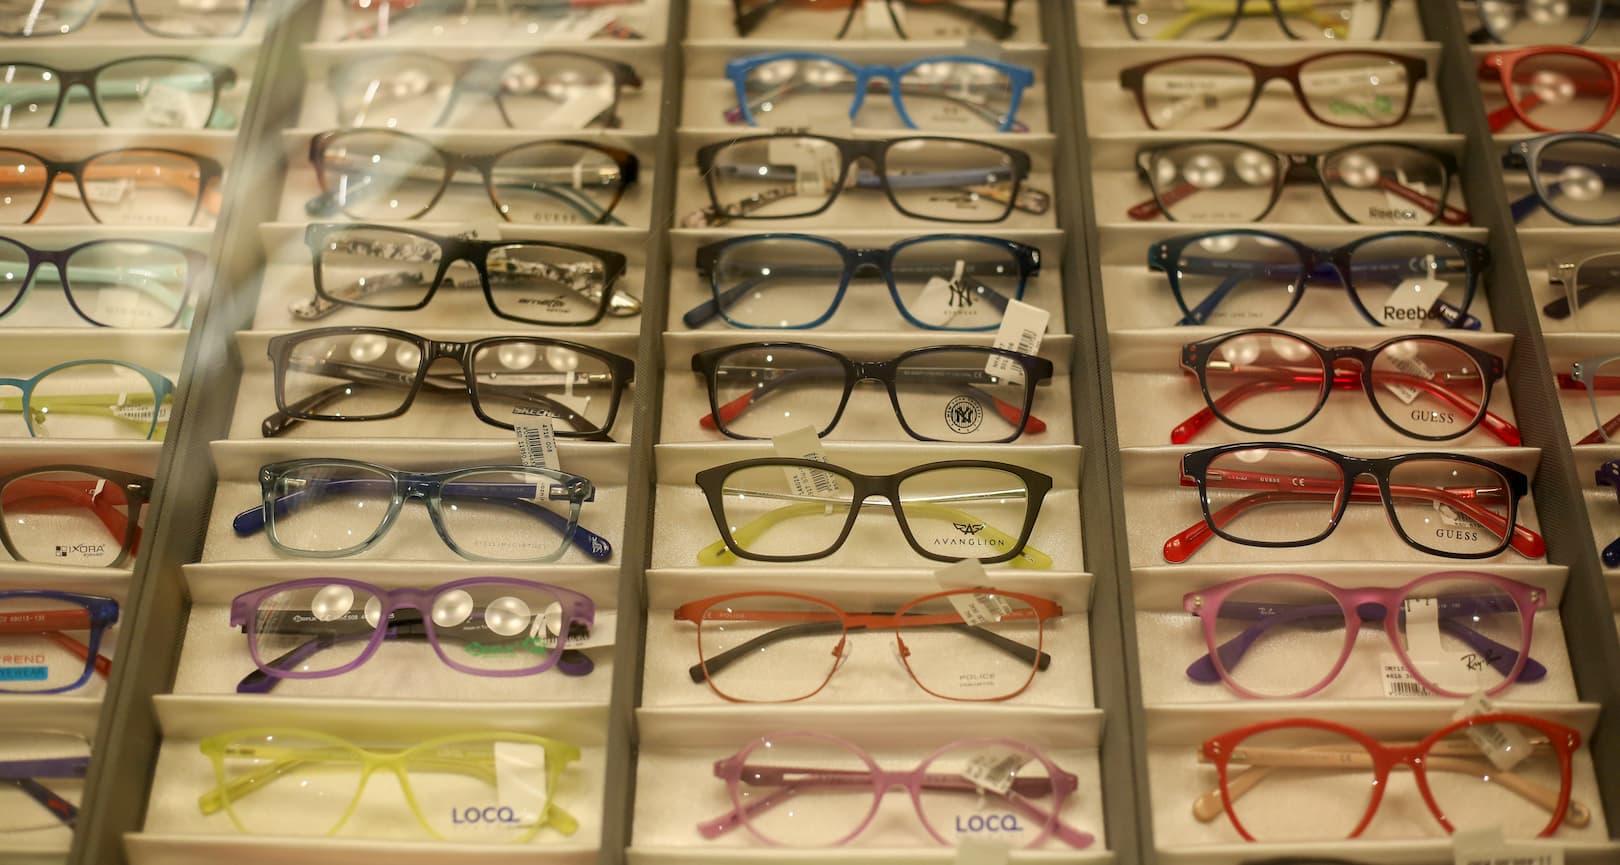 Dioptrijske naočare različitih boja, veličina i brendova